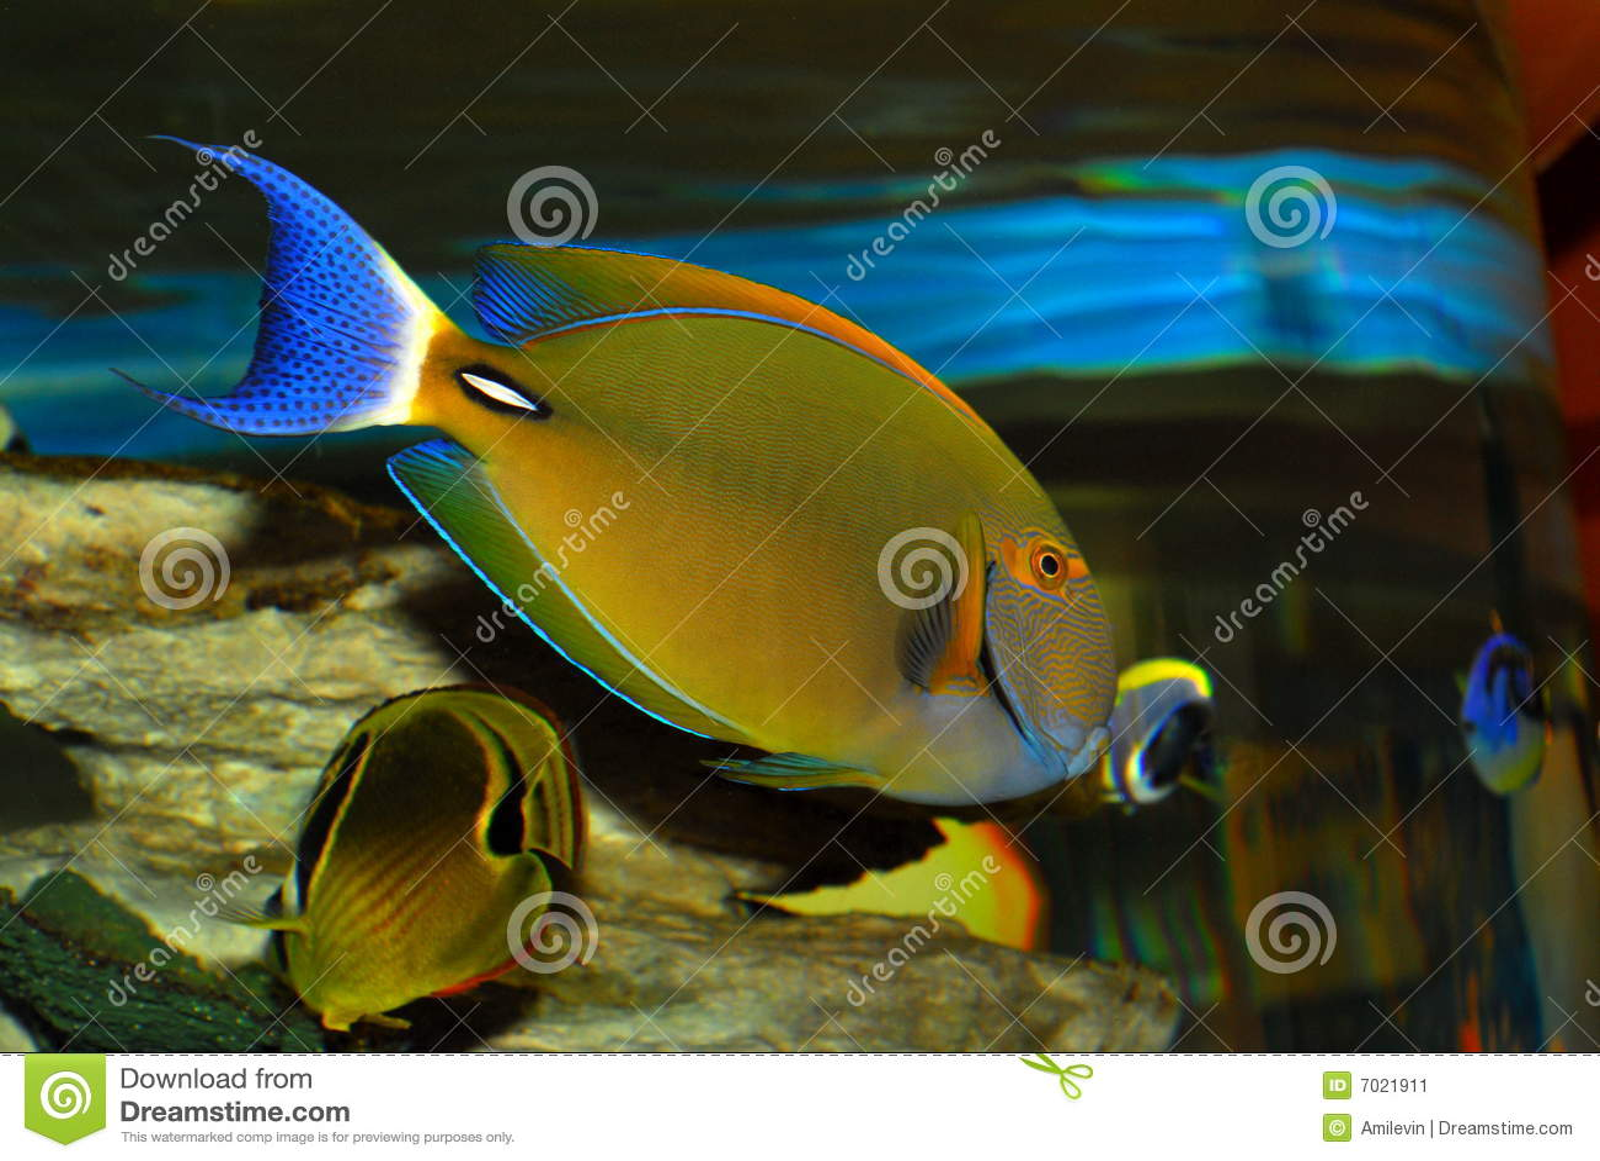 Rare tropical fish stock image image of aquatic green for Rare aquarium fish